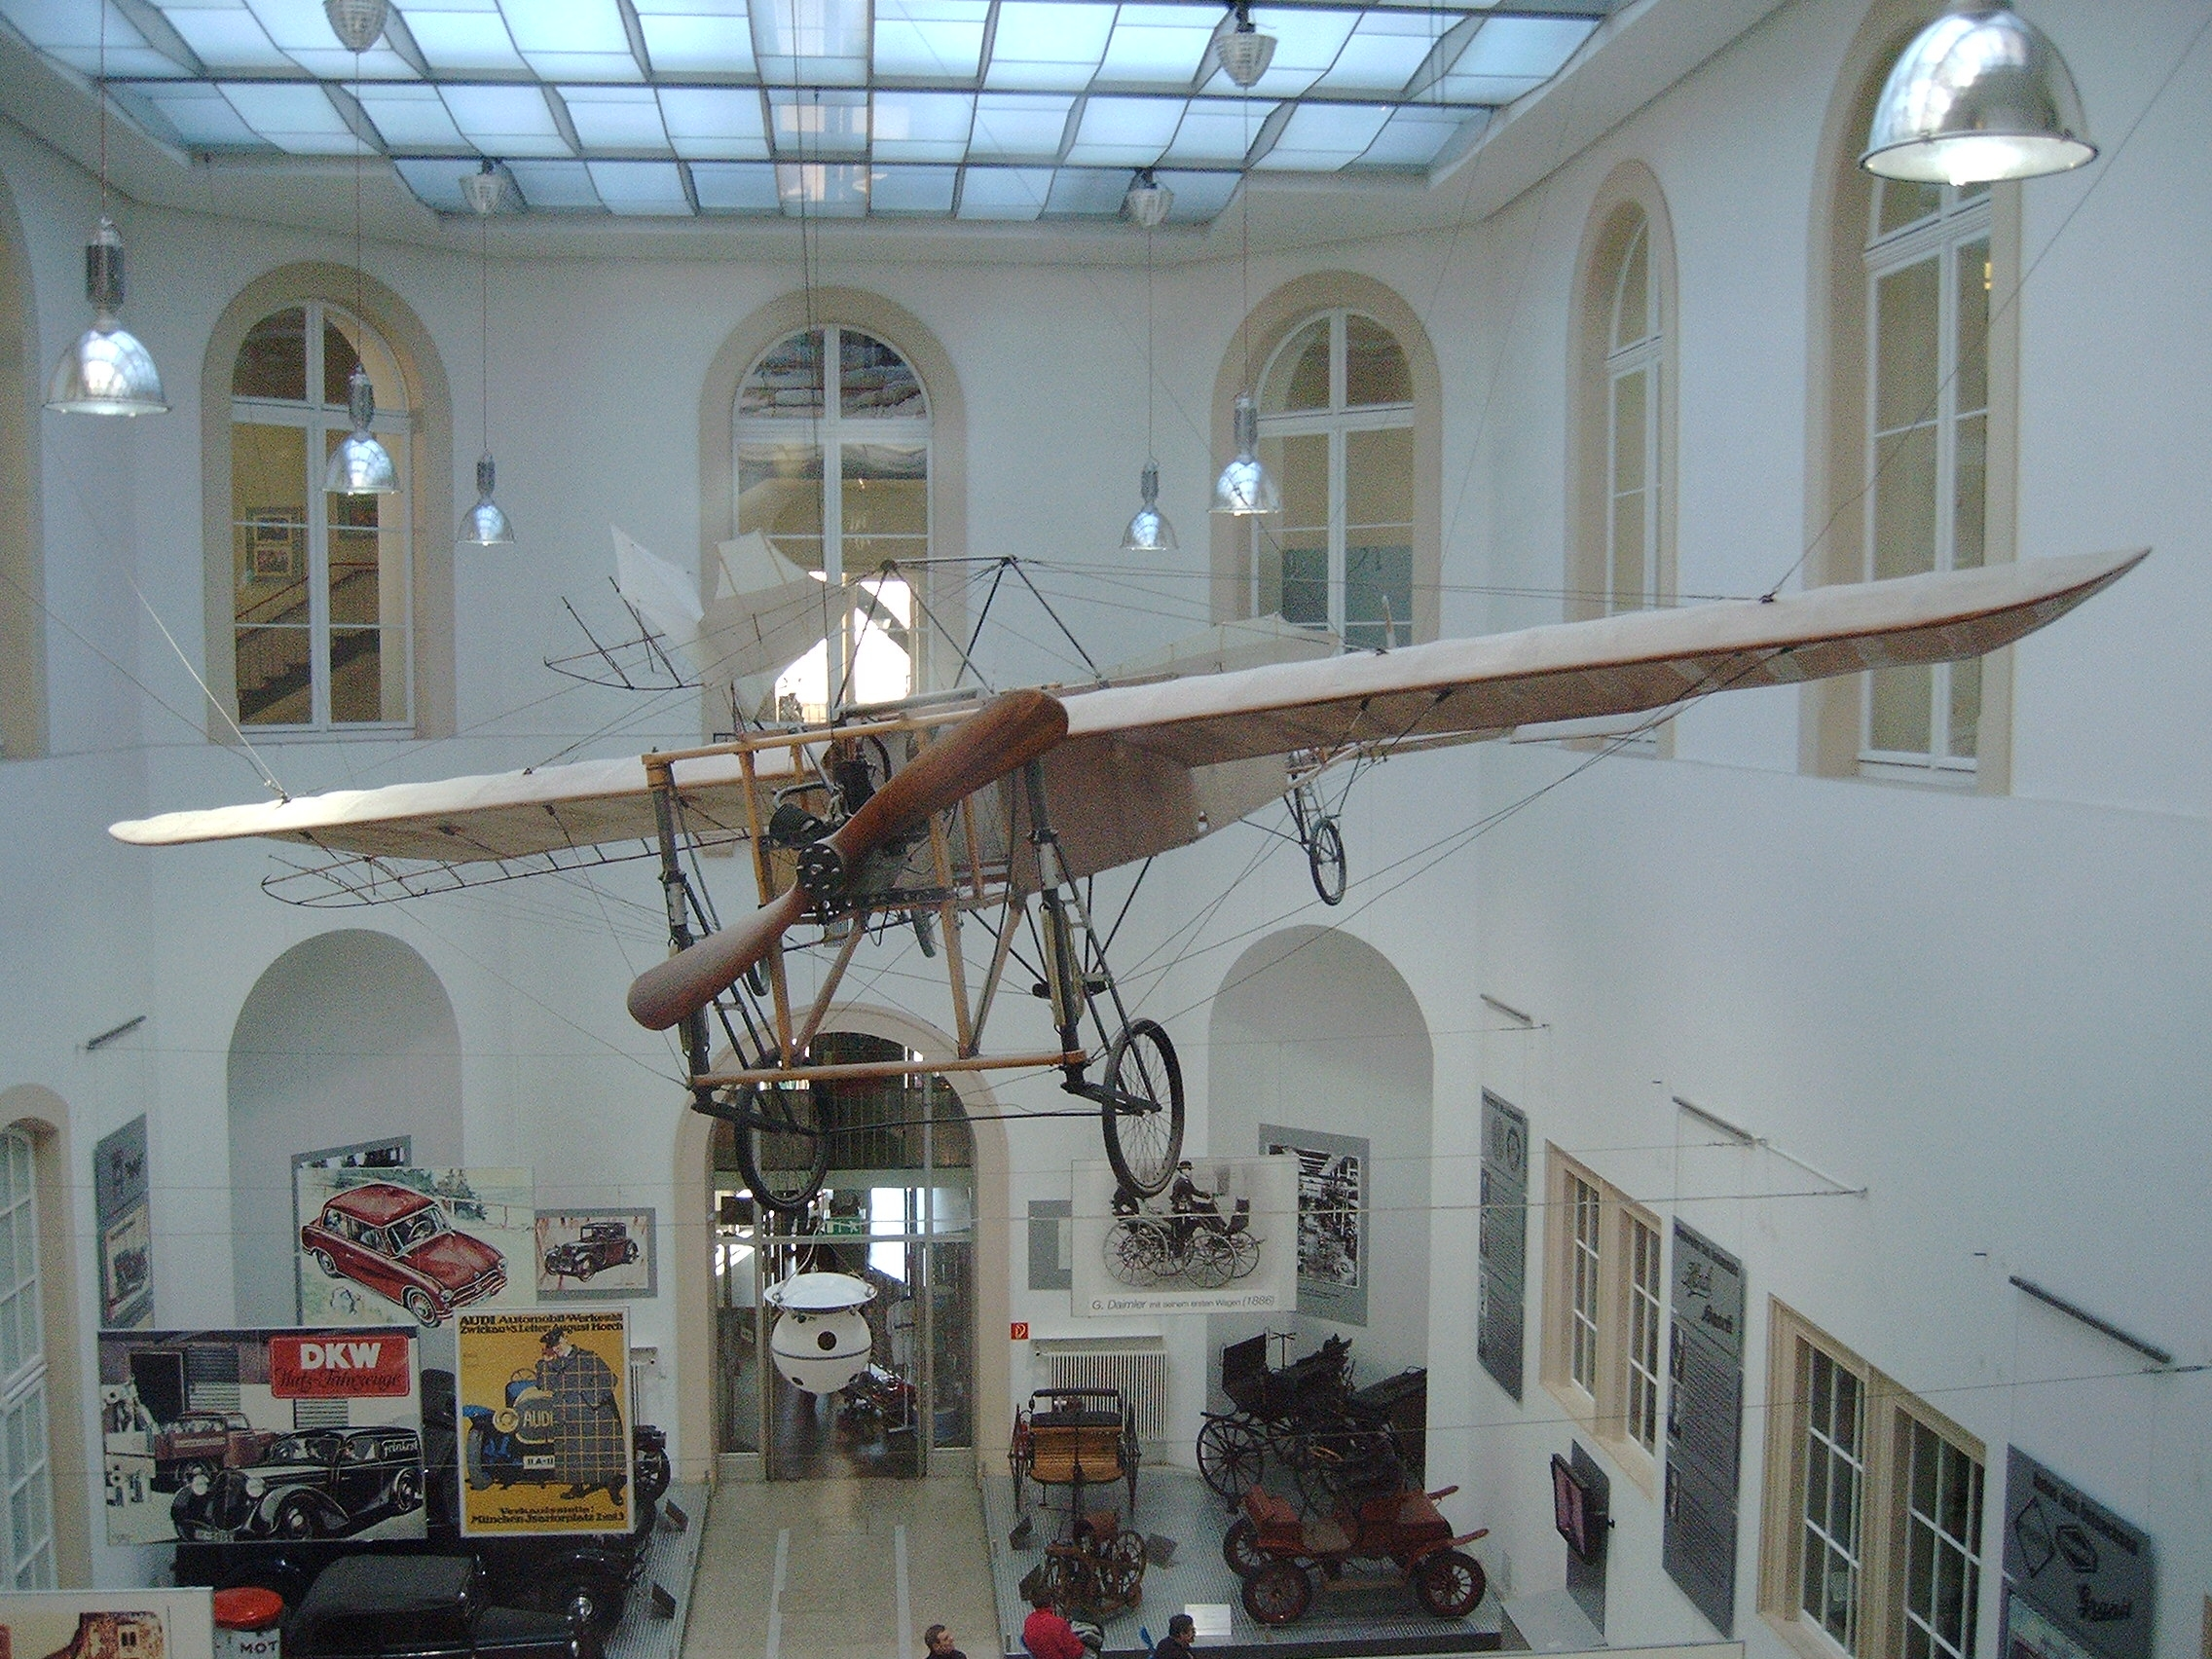 Flugzeug im Verkehrsmuseum Dresden (2005)